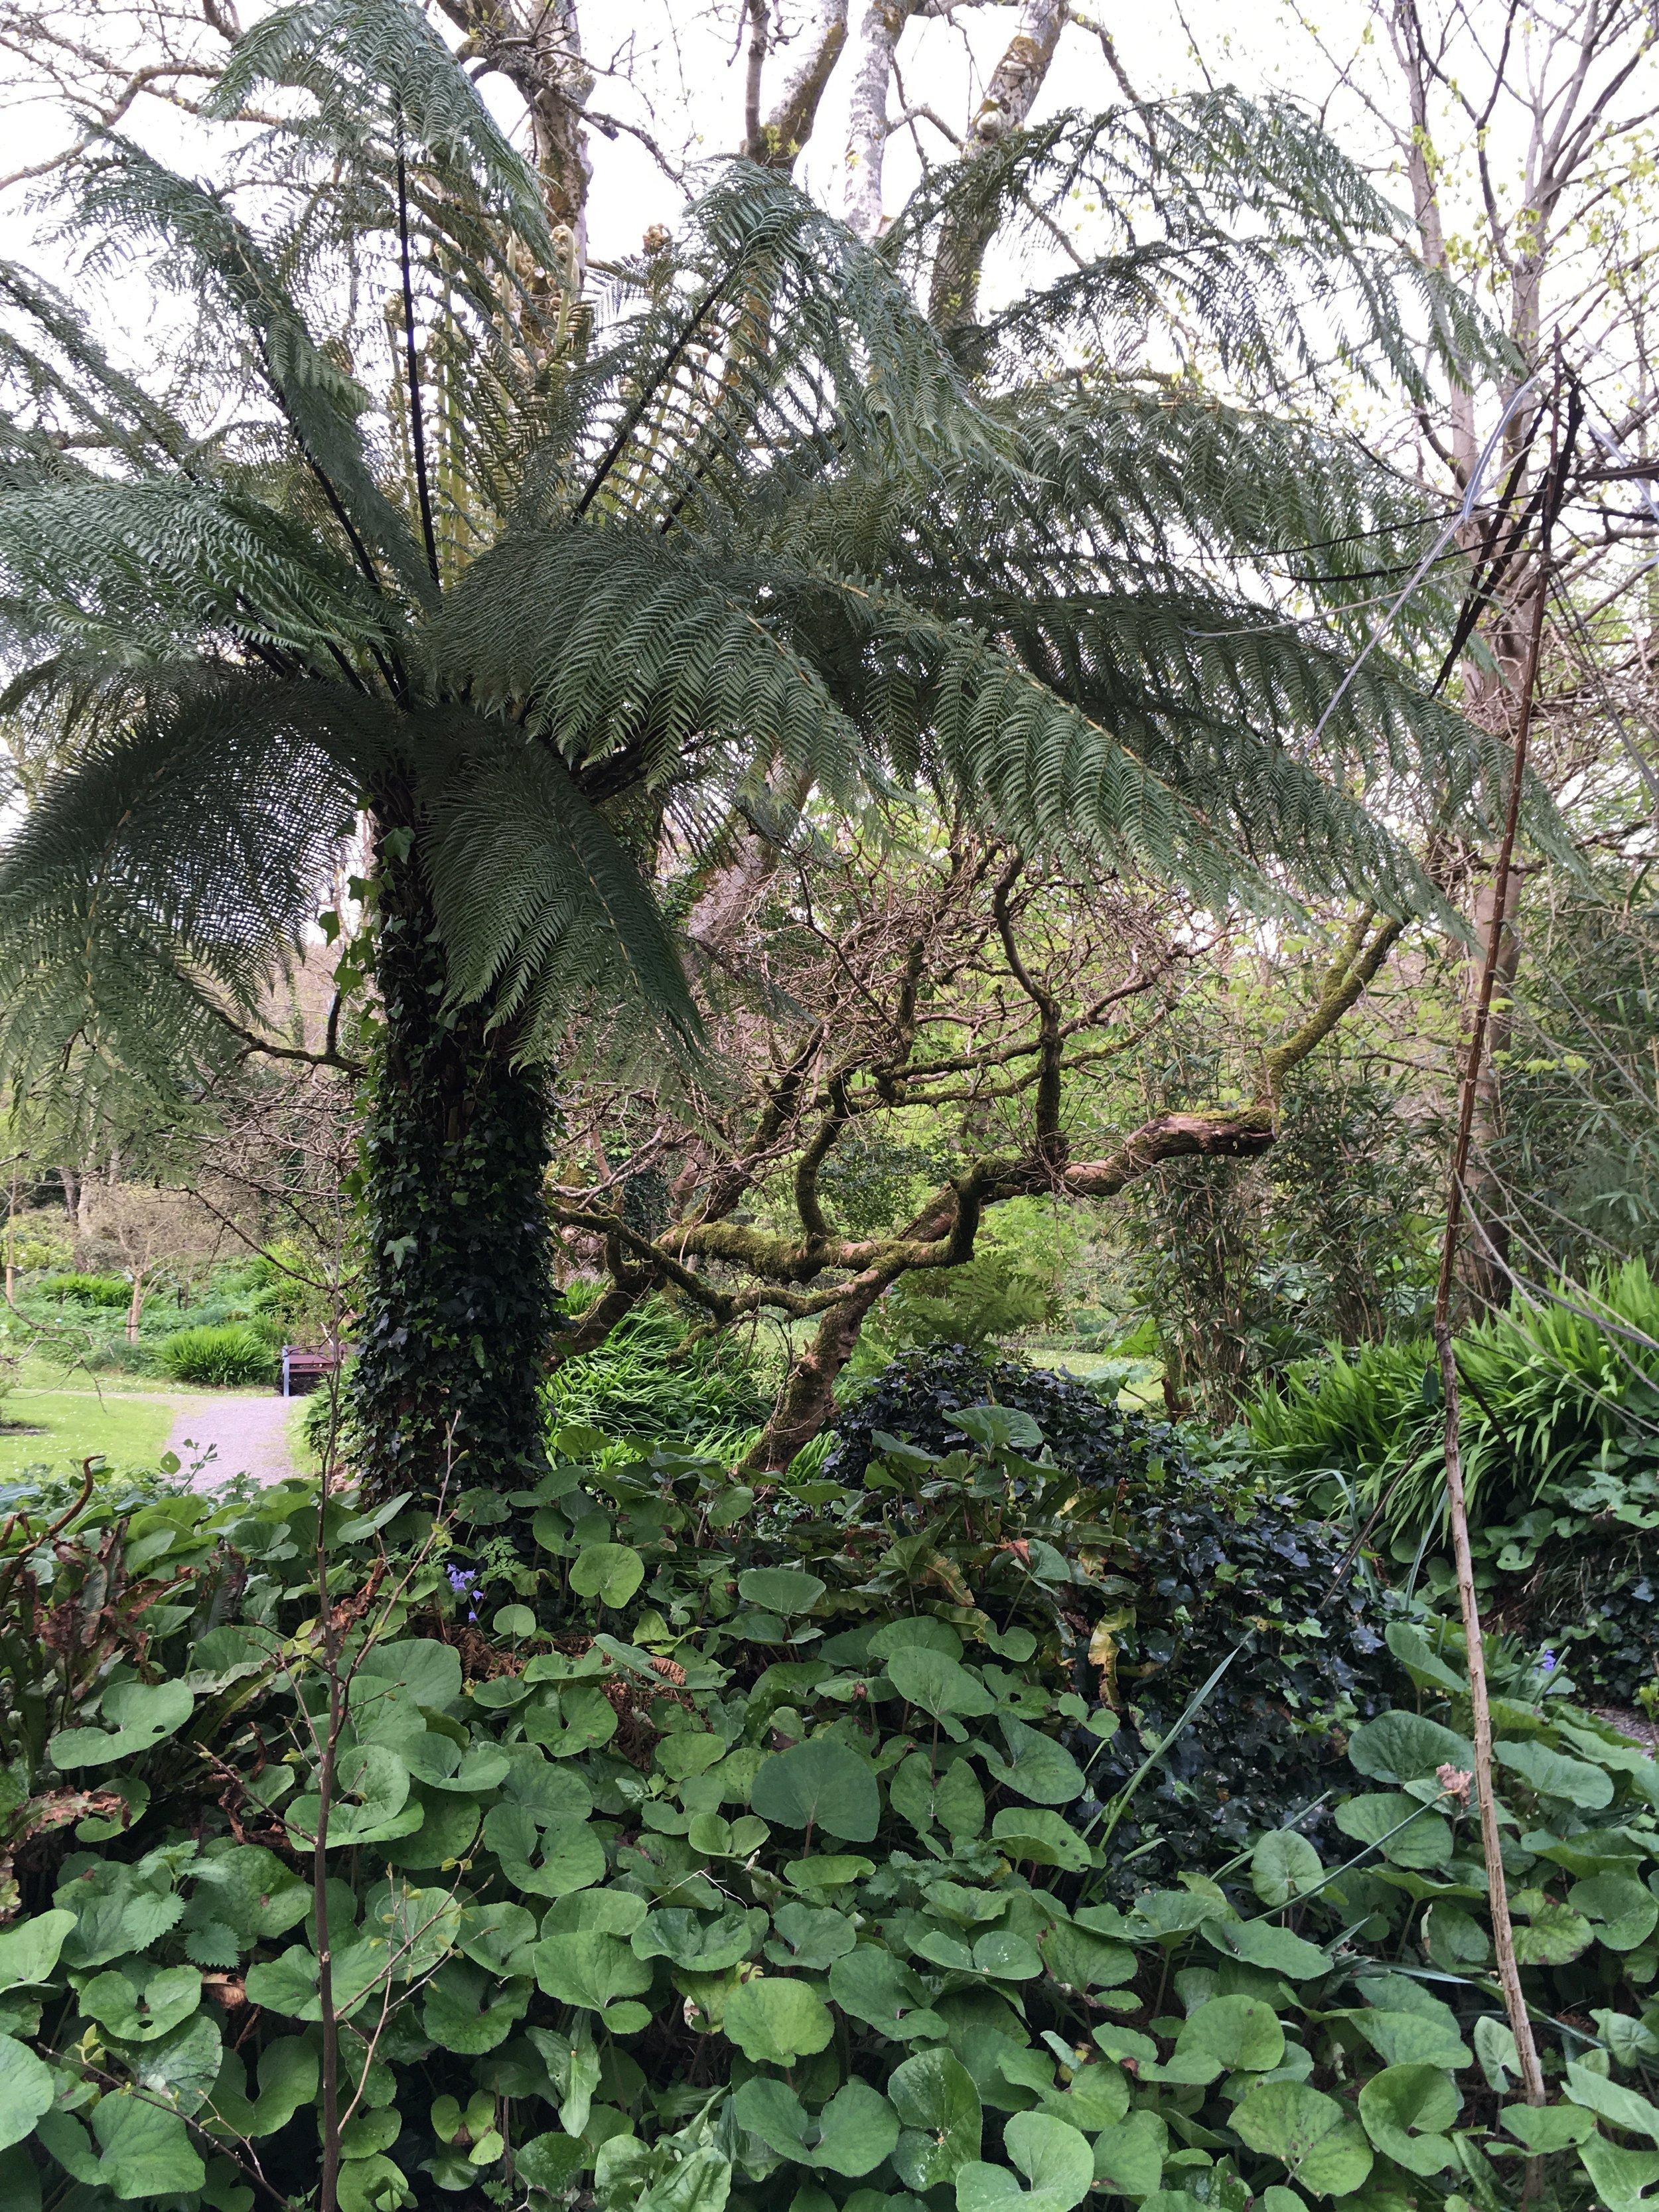 Tree fern in the Derrynane Gardens.